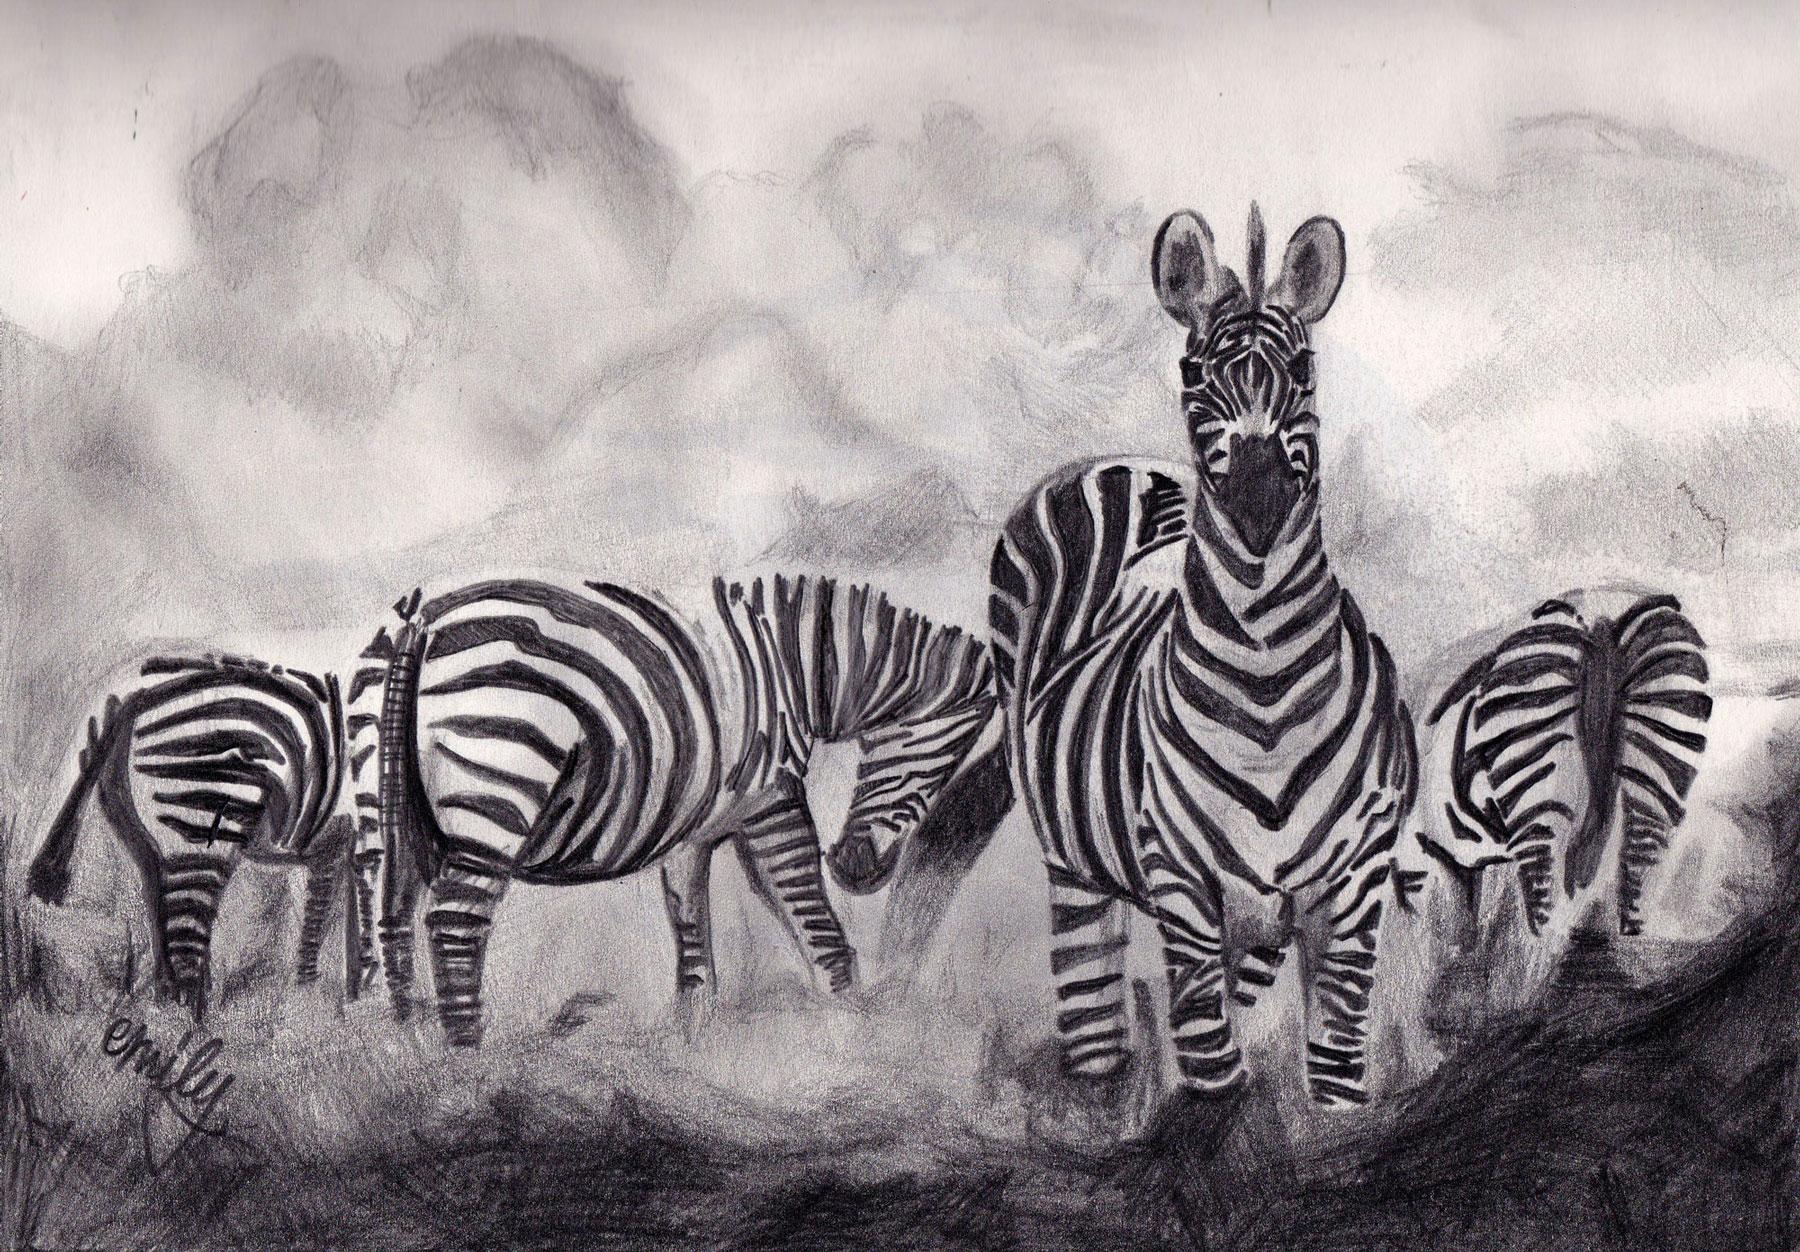 Illustration of Zebras by Emily McCubben